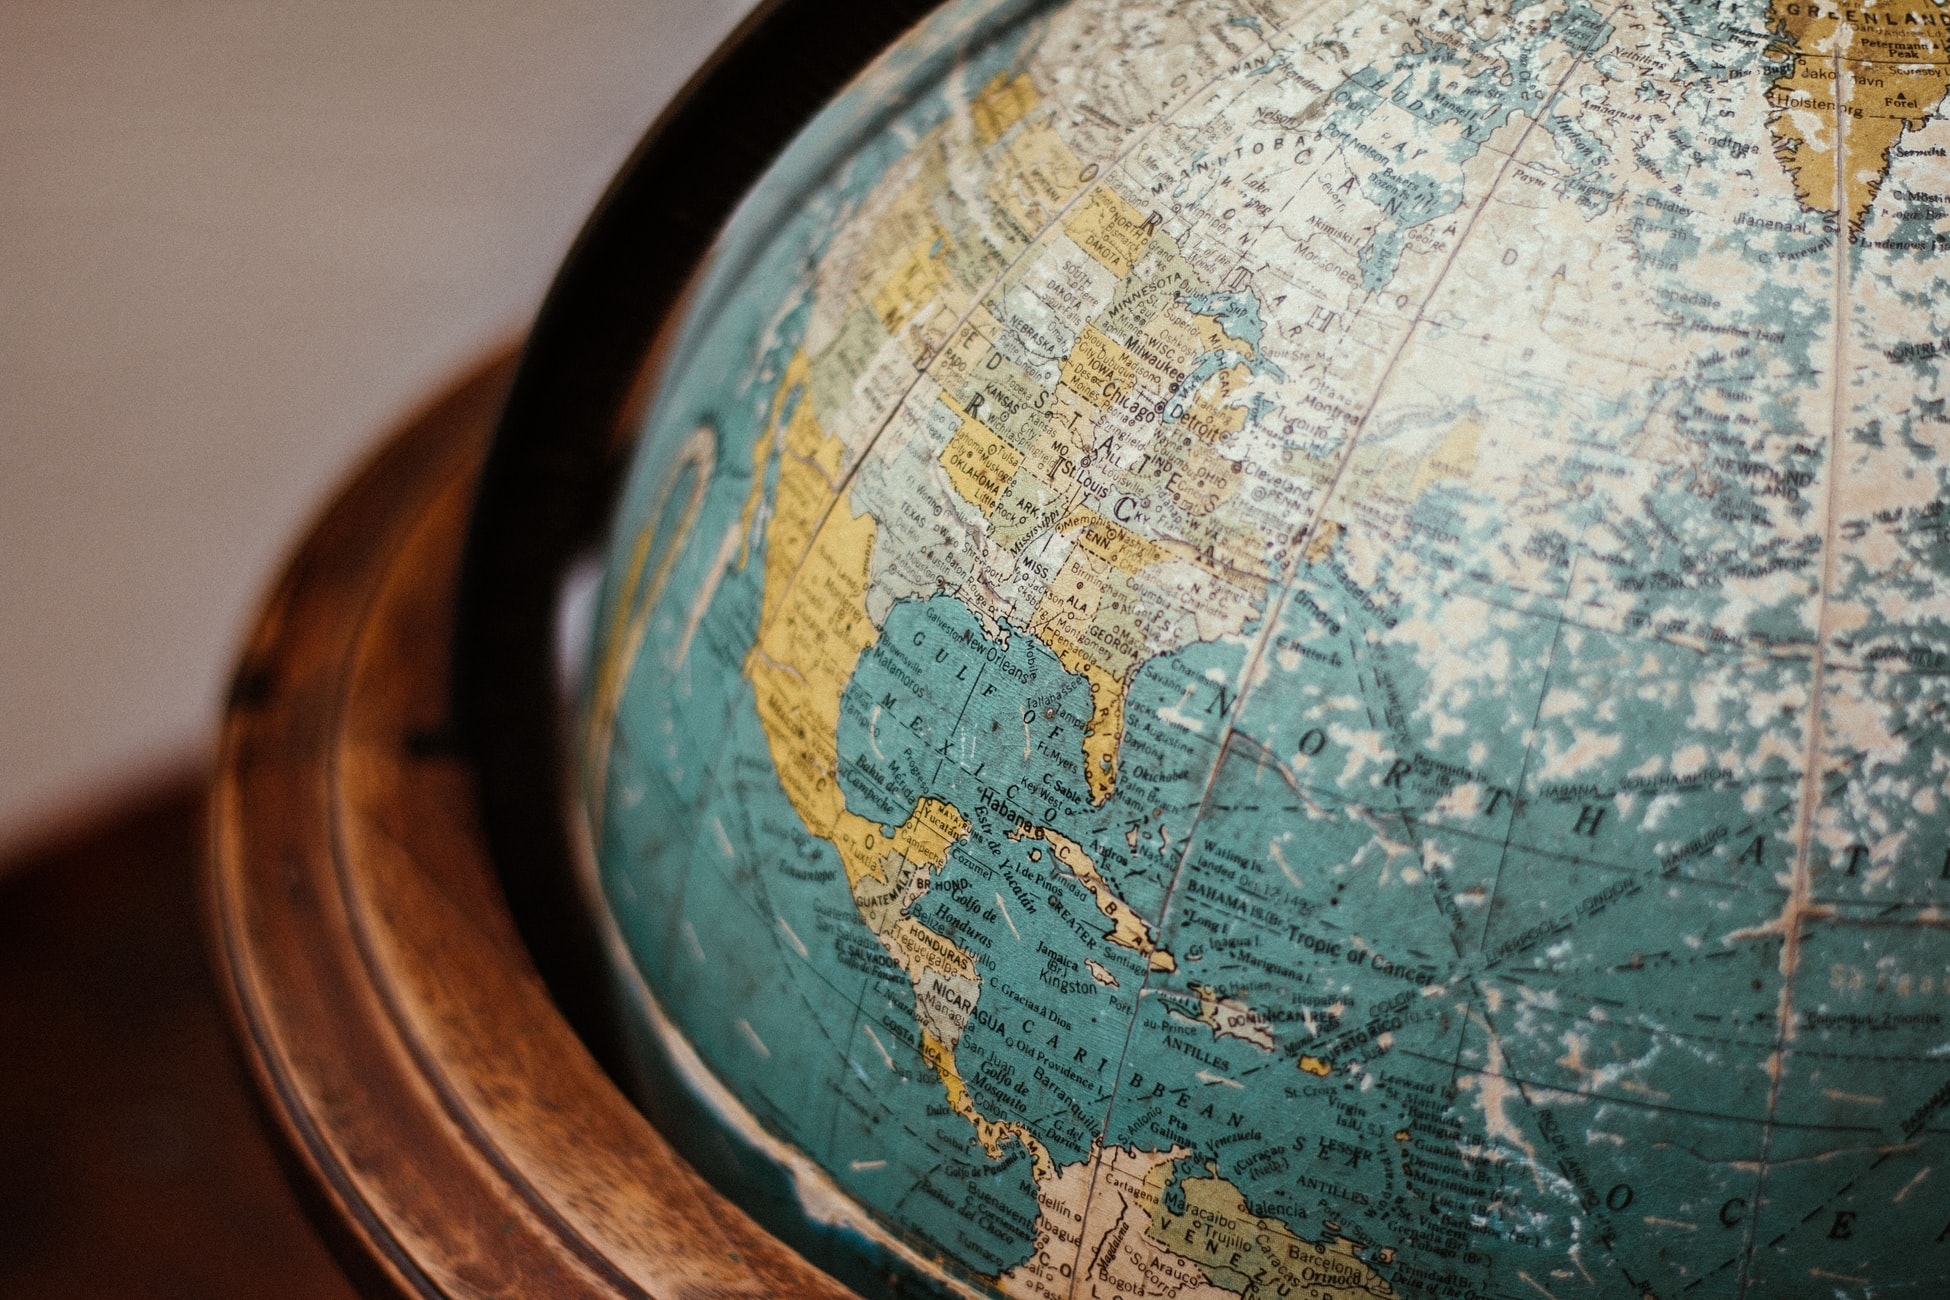 wheretoinvest-investmentmarkets-investingduringpandemic